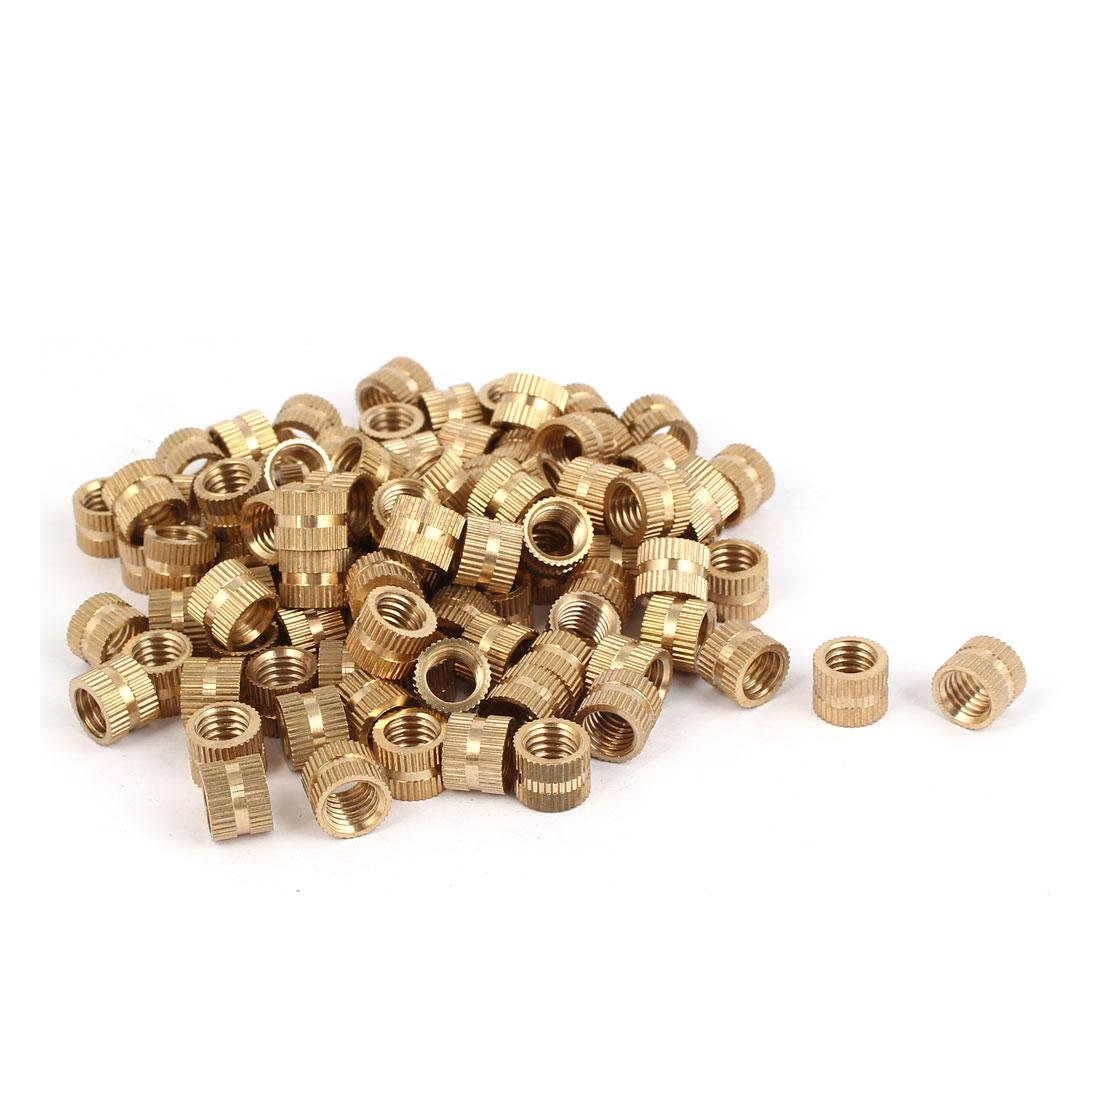 M8 x 8mm x 1.25mm Brass Knurled Threaded Round Insert Embedded Nuts 100PCS